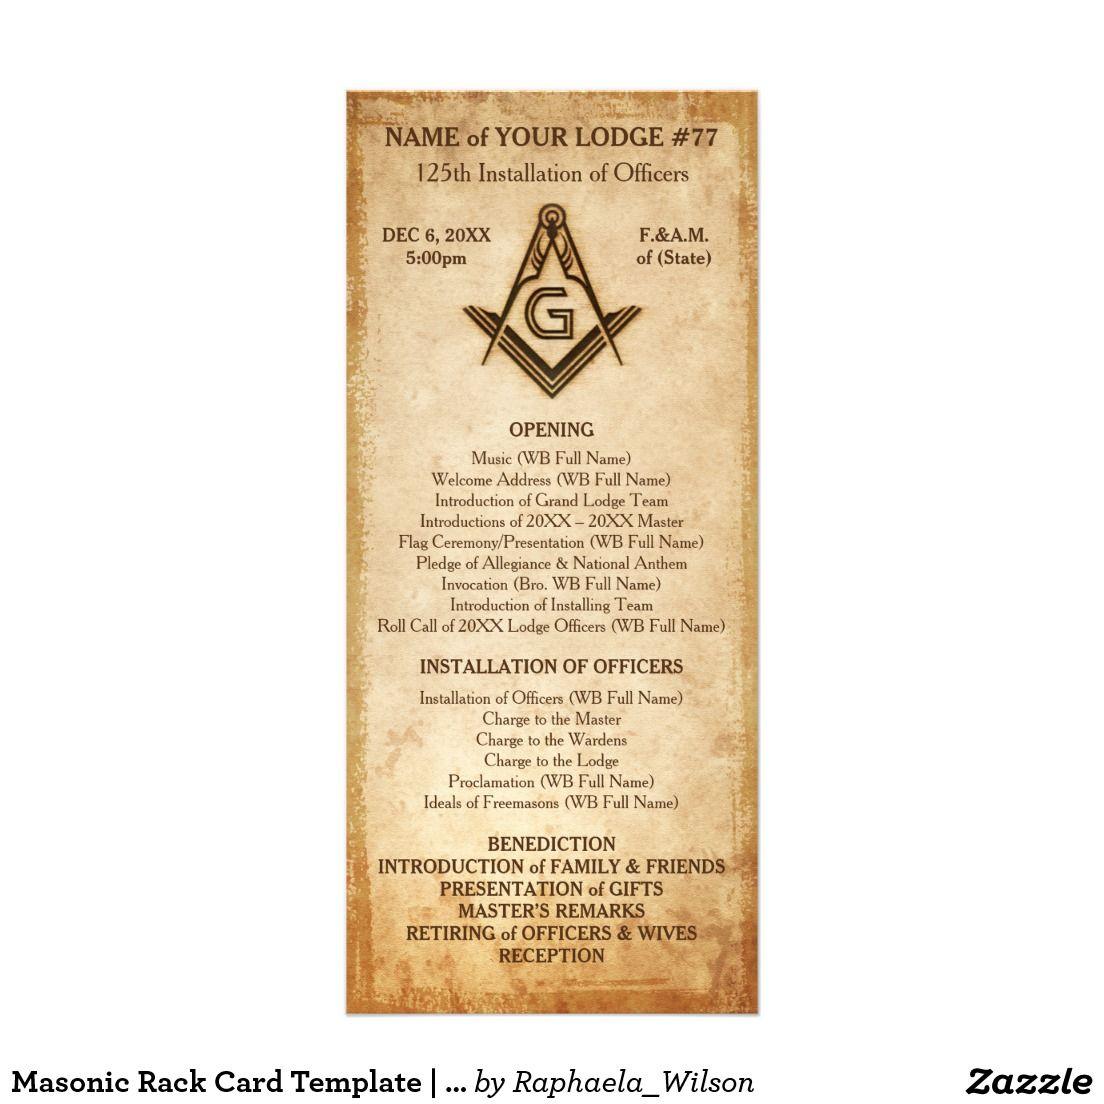 Masonic Rack Card Template | Old Rustic Parchment | Custom Masonic ...